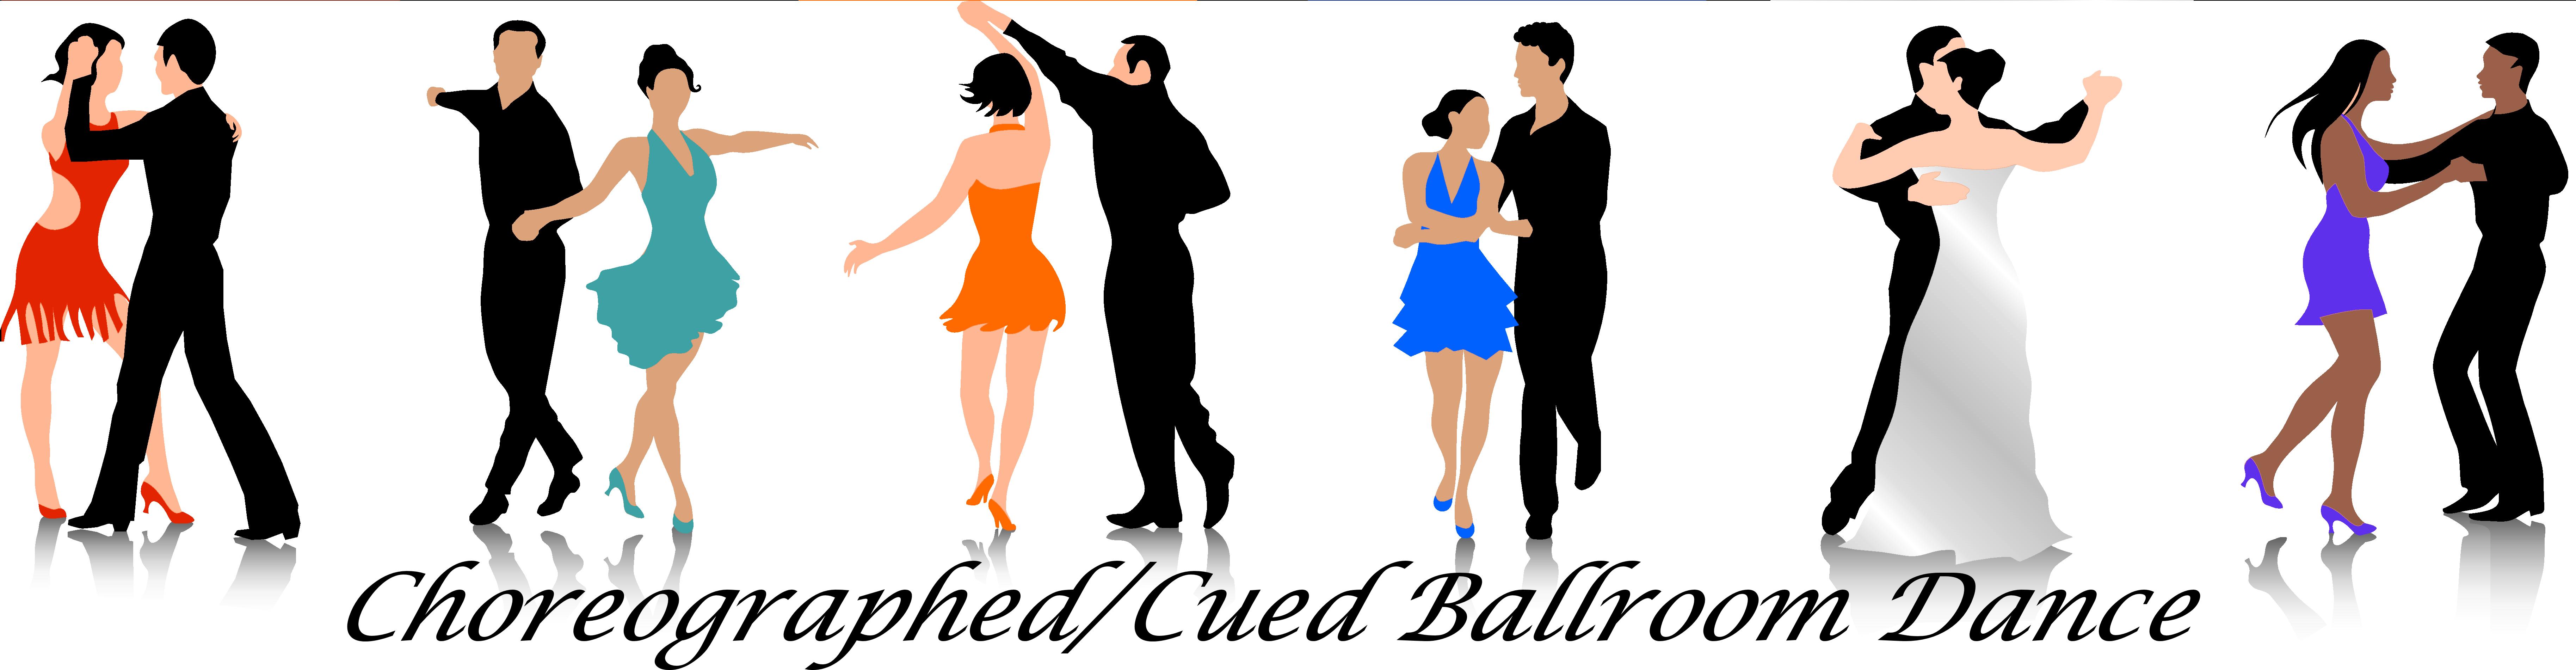 Cued Ballroom Dance